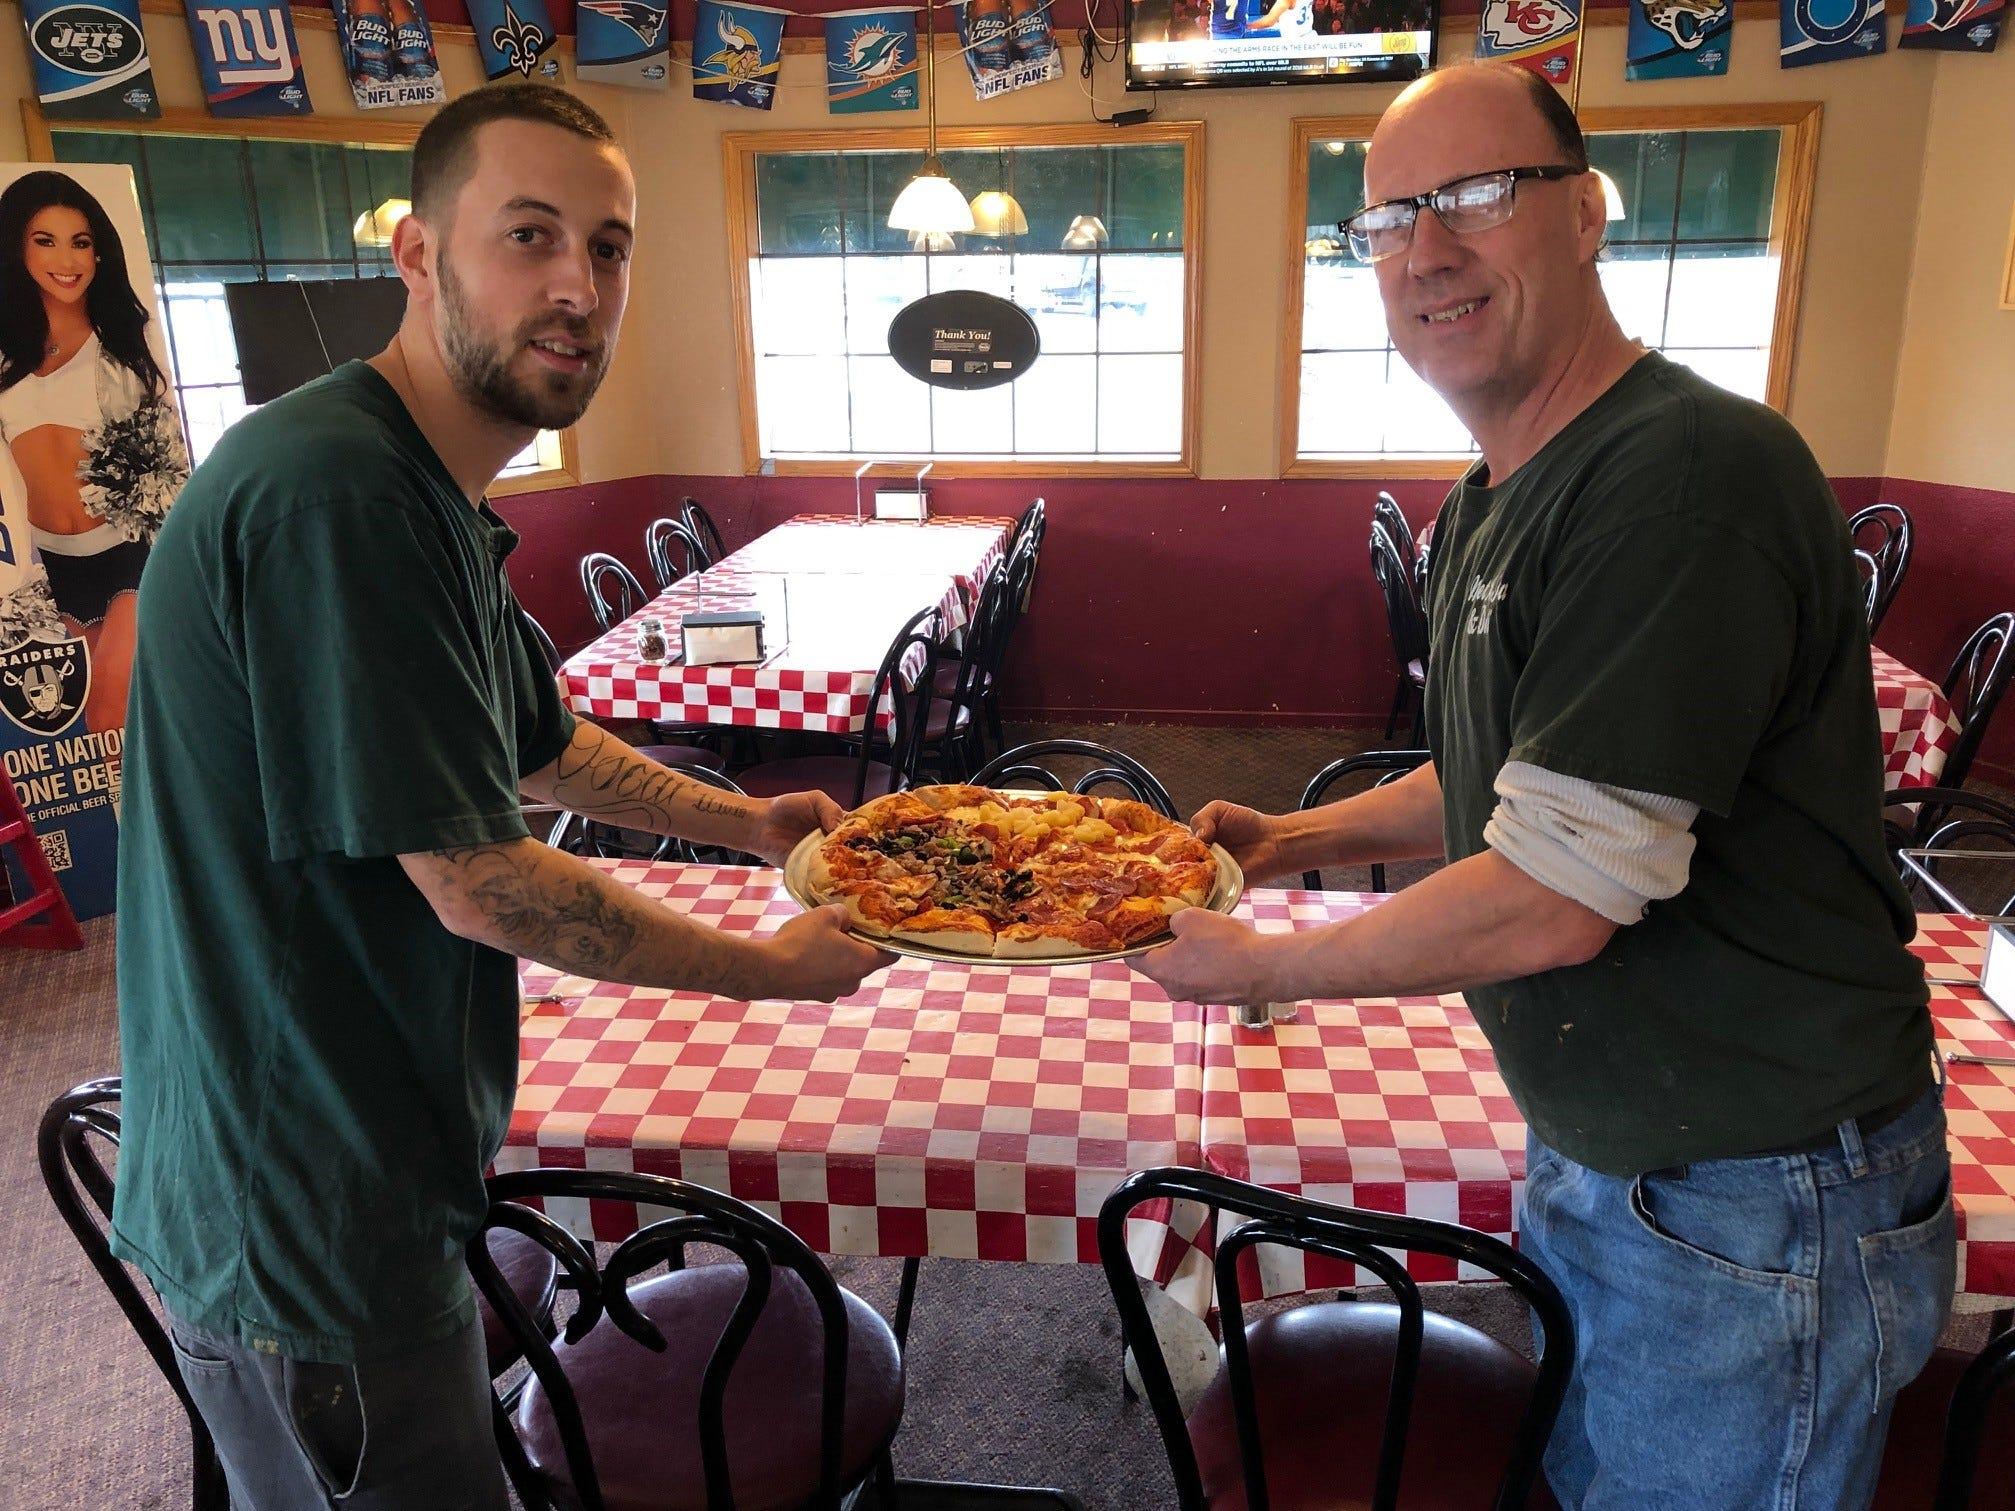 Market Street Pizza co-owner Tony Trapozzano, right, with son Brandon.